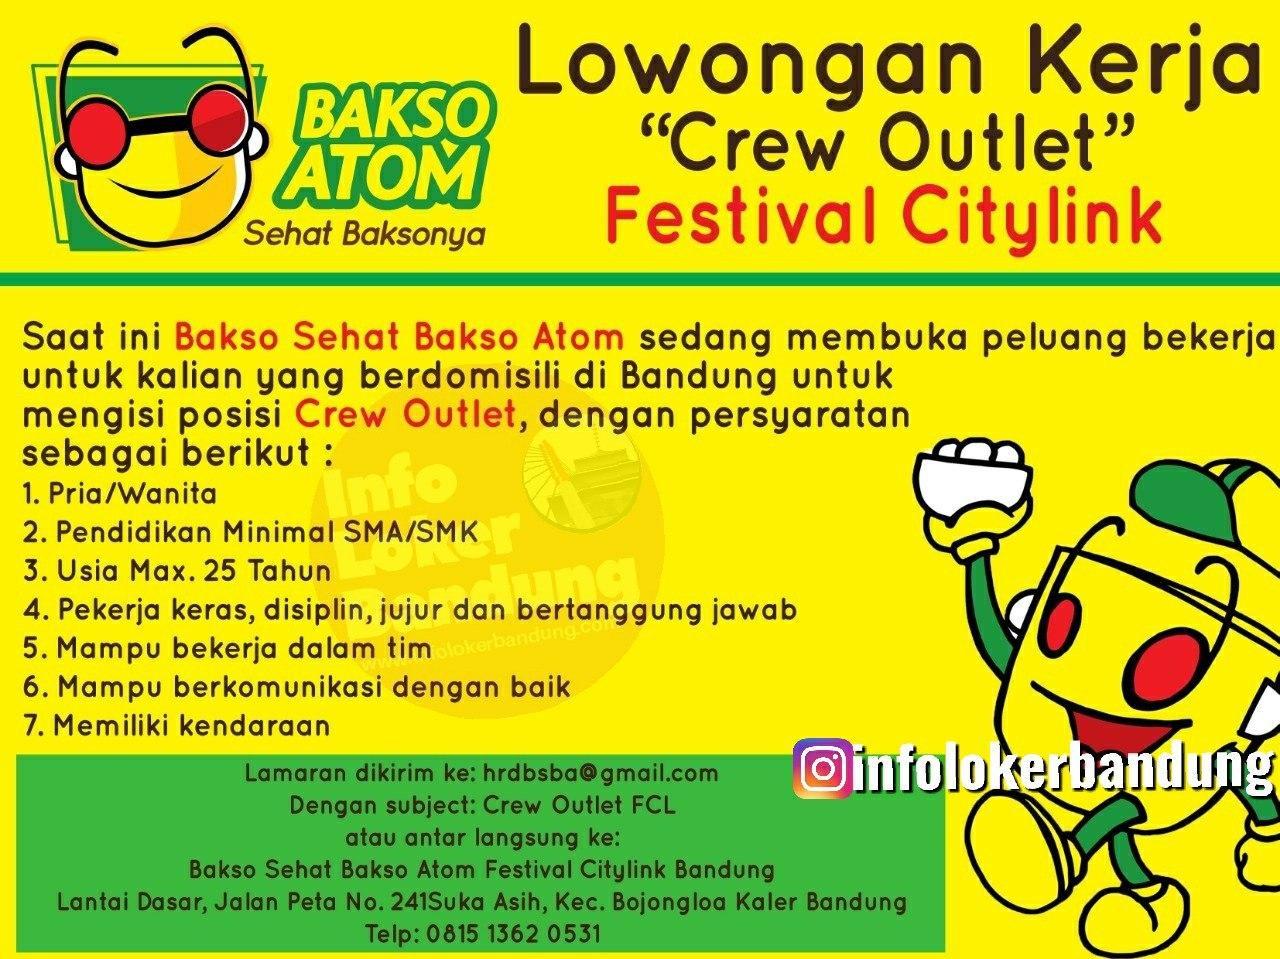 Lowongan Kerja Crew Outlet Bakso Atom Festival Citylink Bandung Februari 2020